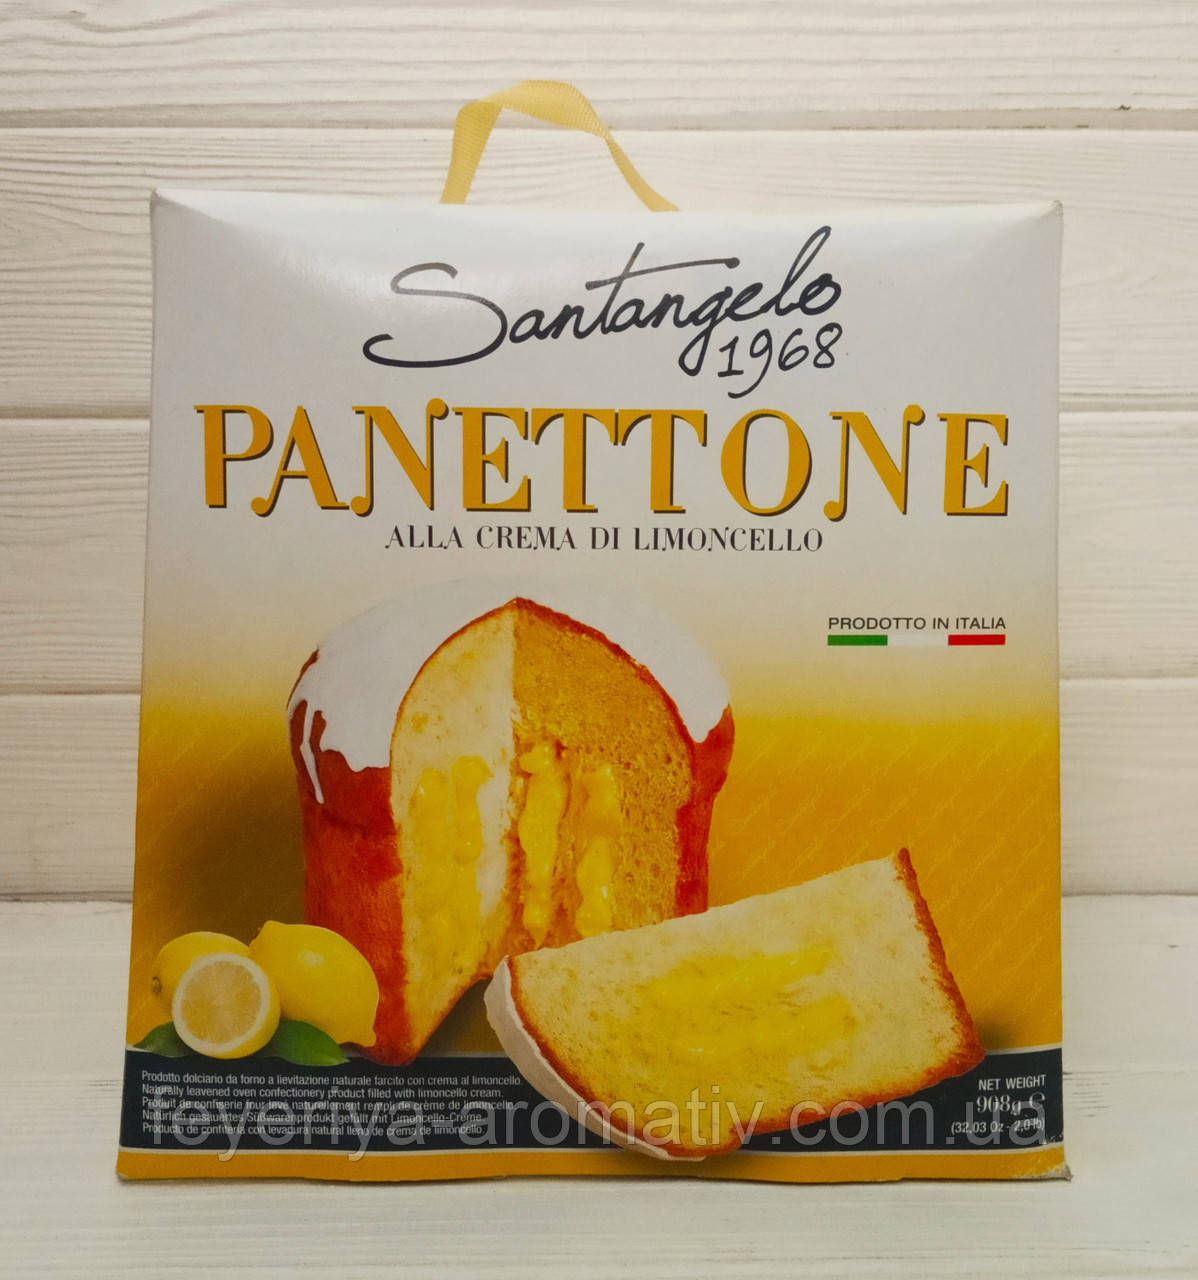 Пирог с лимонной начинкой панеттоне Santangelo Panettone, 908гр (Италия)